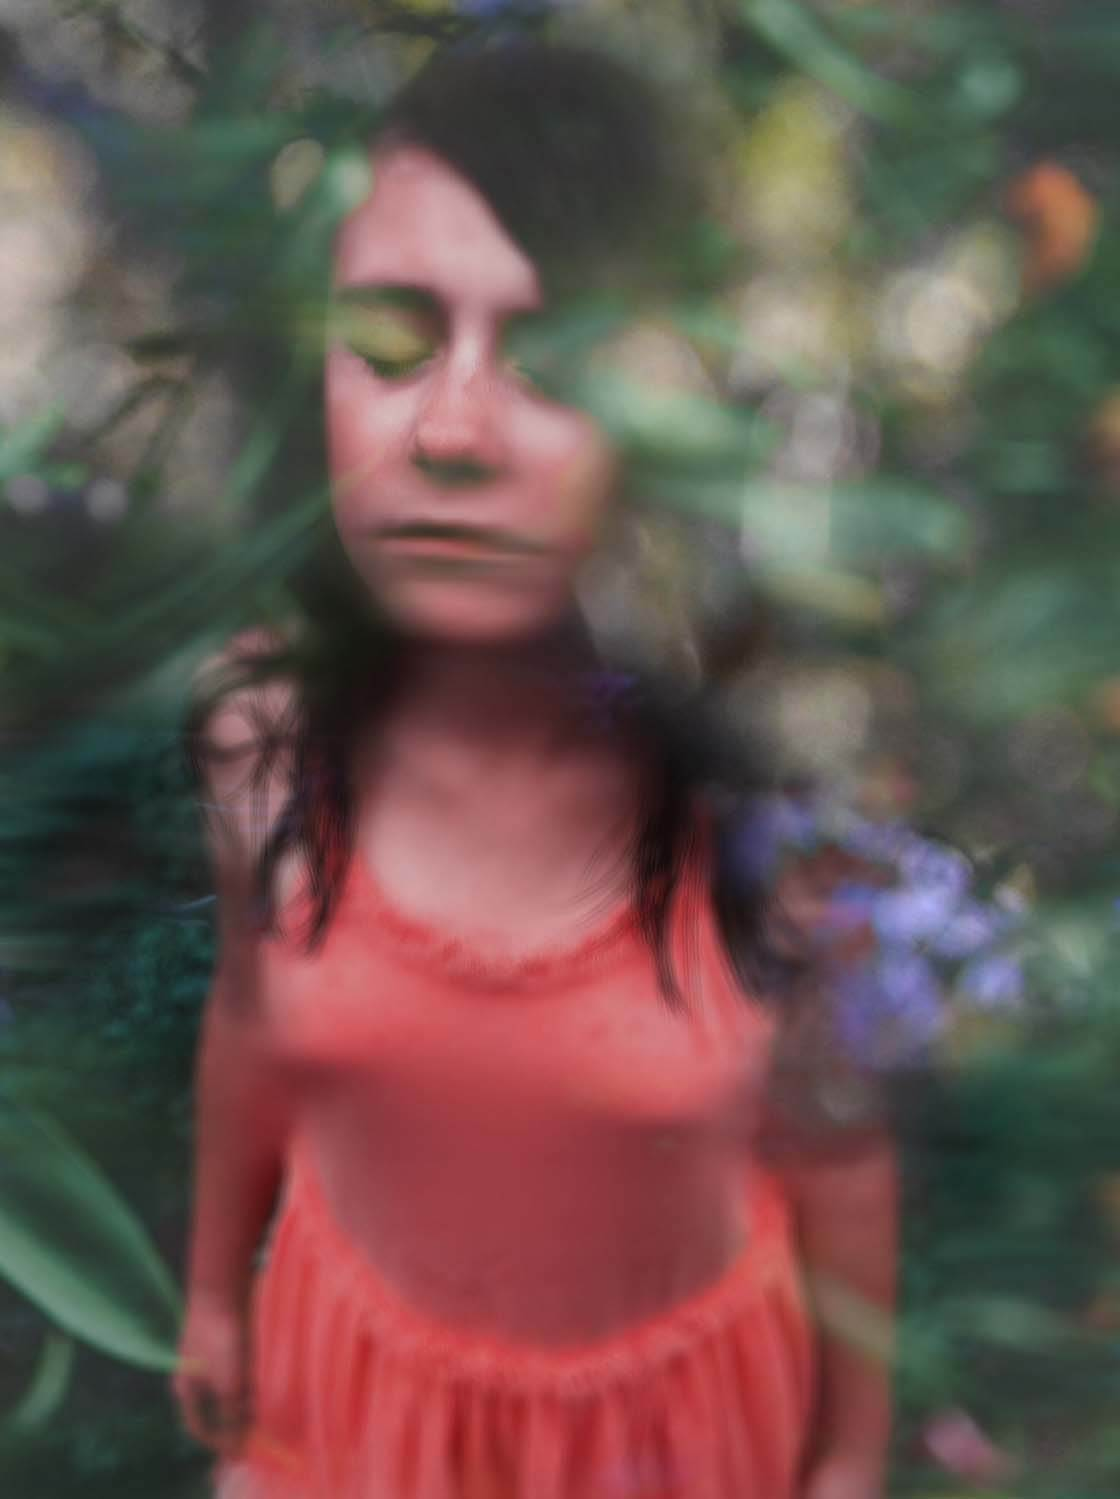 Veronica Hassel iPhone Photos 22 no script